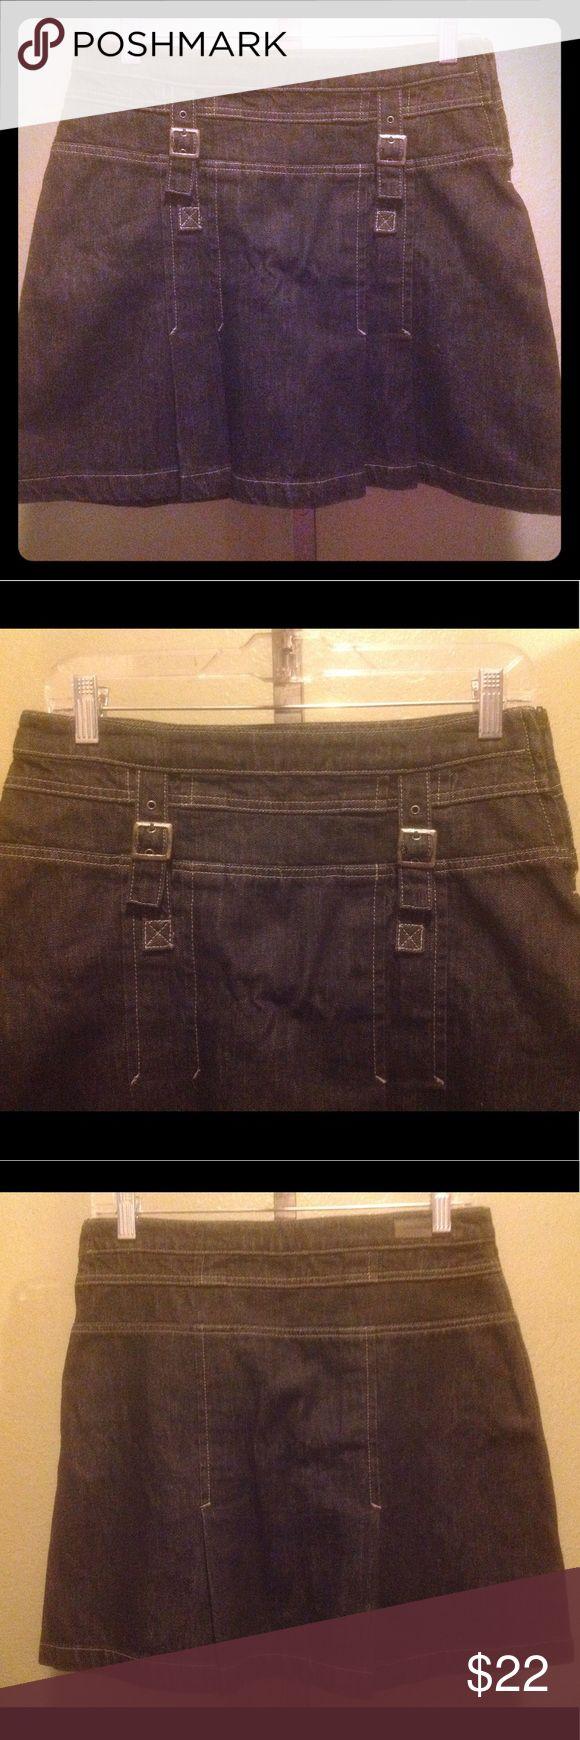 SALE 💄 Calvin Klein denim skirt size 4 EUC black denim skirt. Size 4 Calvin Klein Jeans Skirts Mini